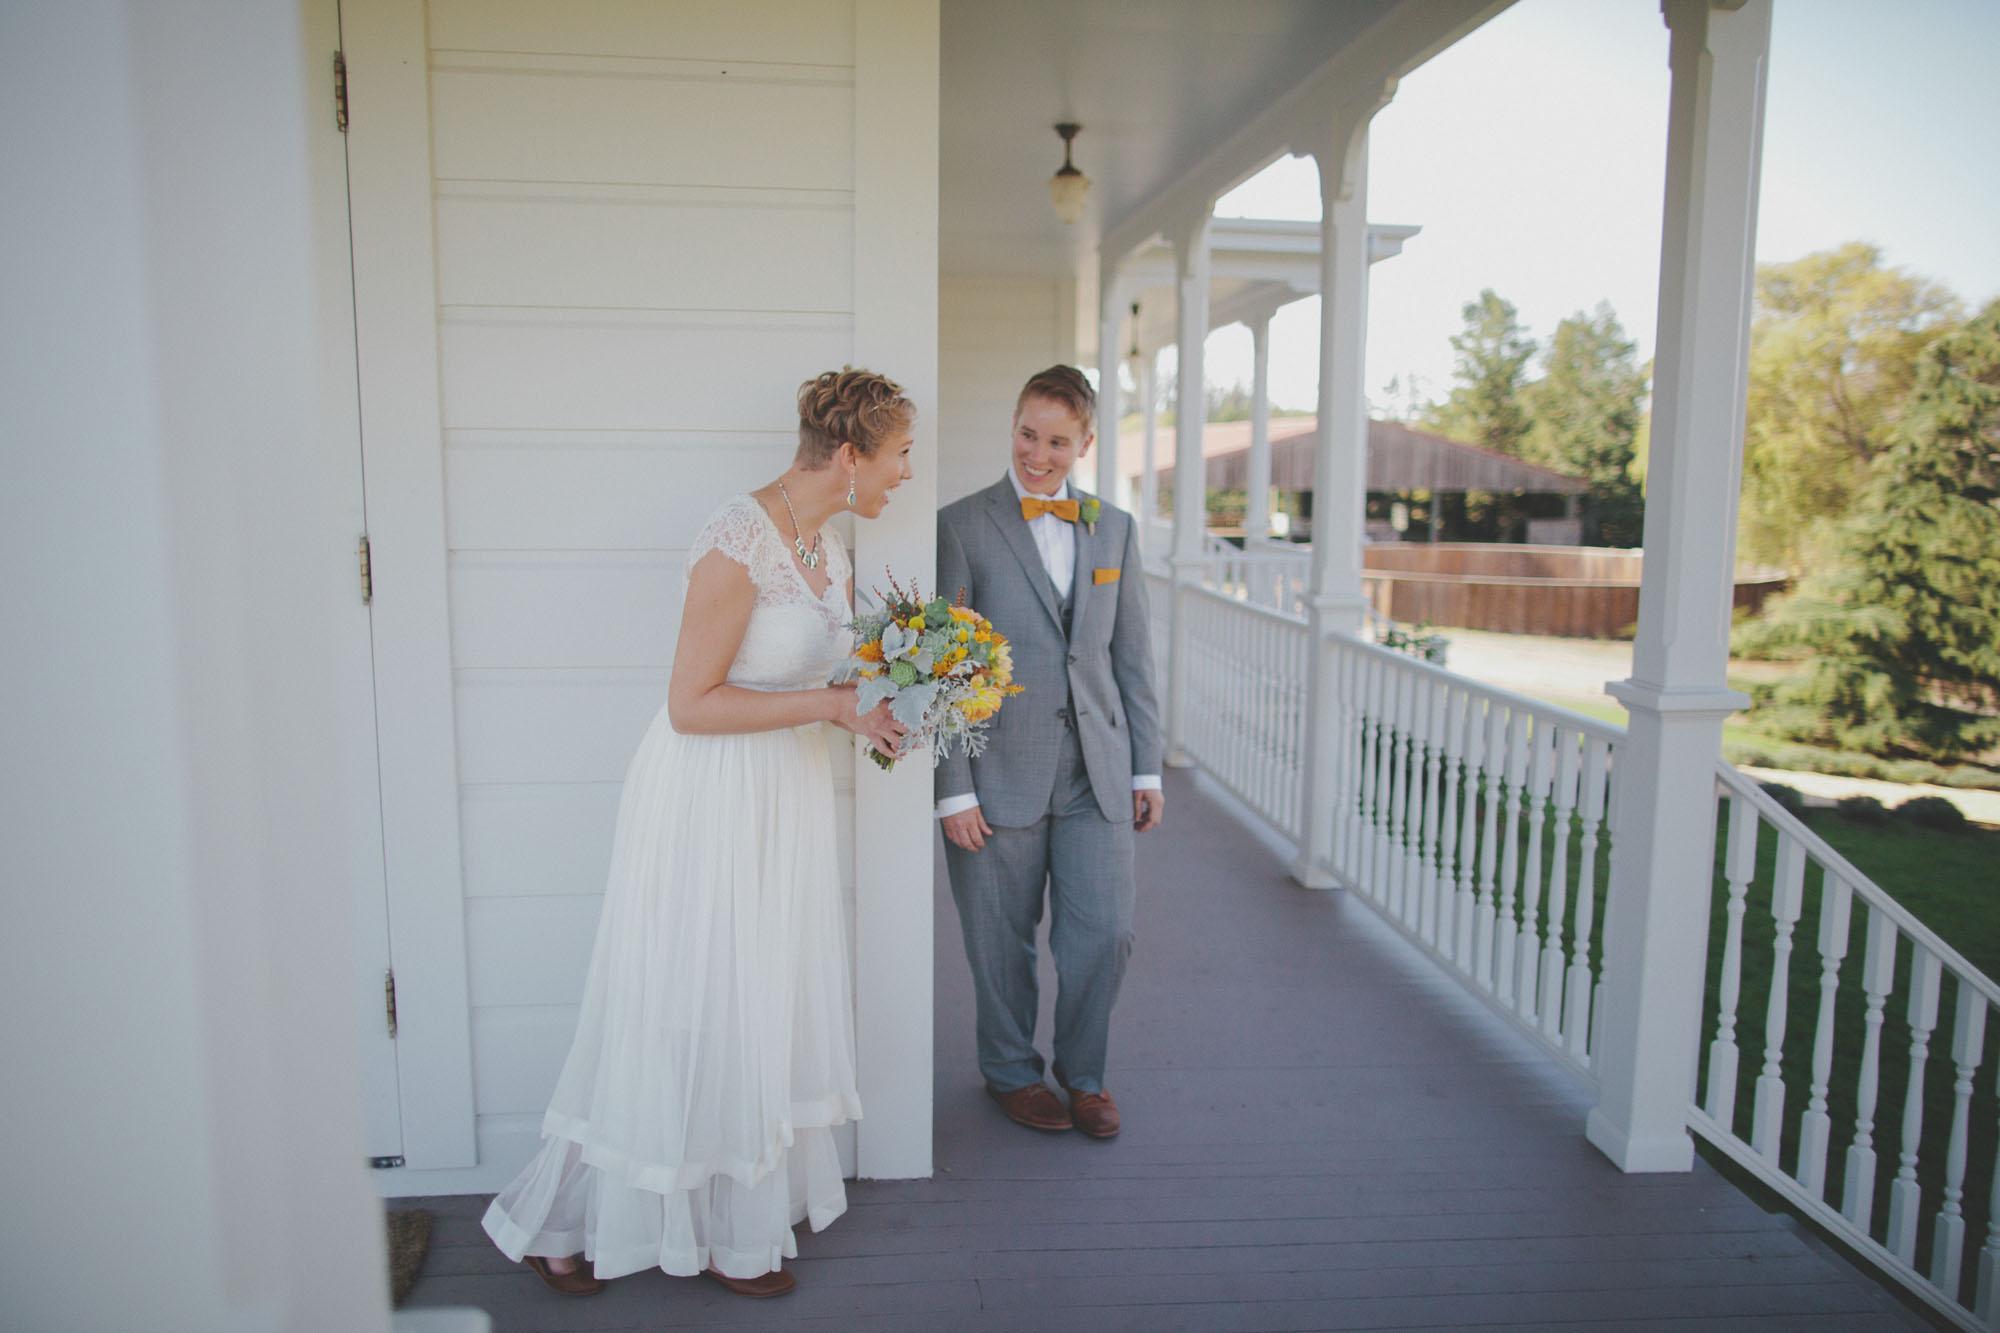 Gretchen_Gause_Petaluma_Olympias_Valley_Wedding_Photo-090.jpg